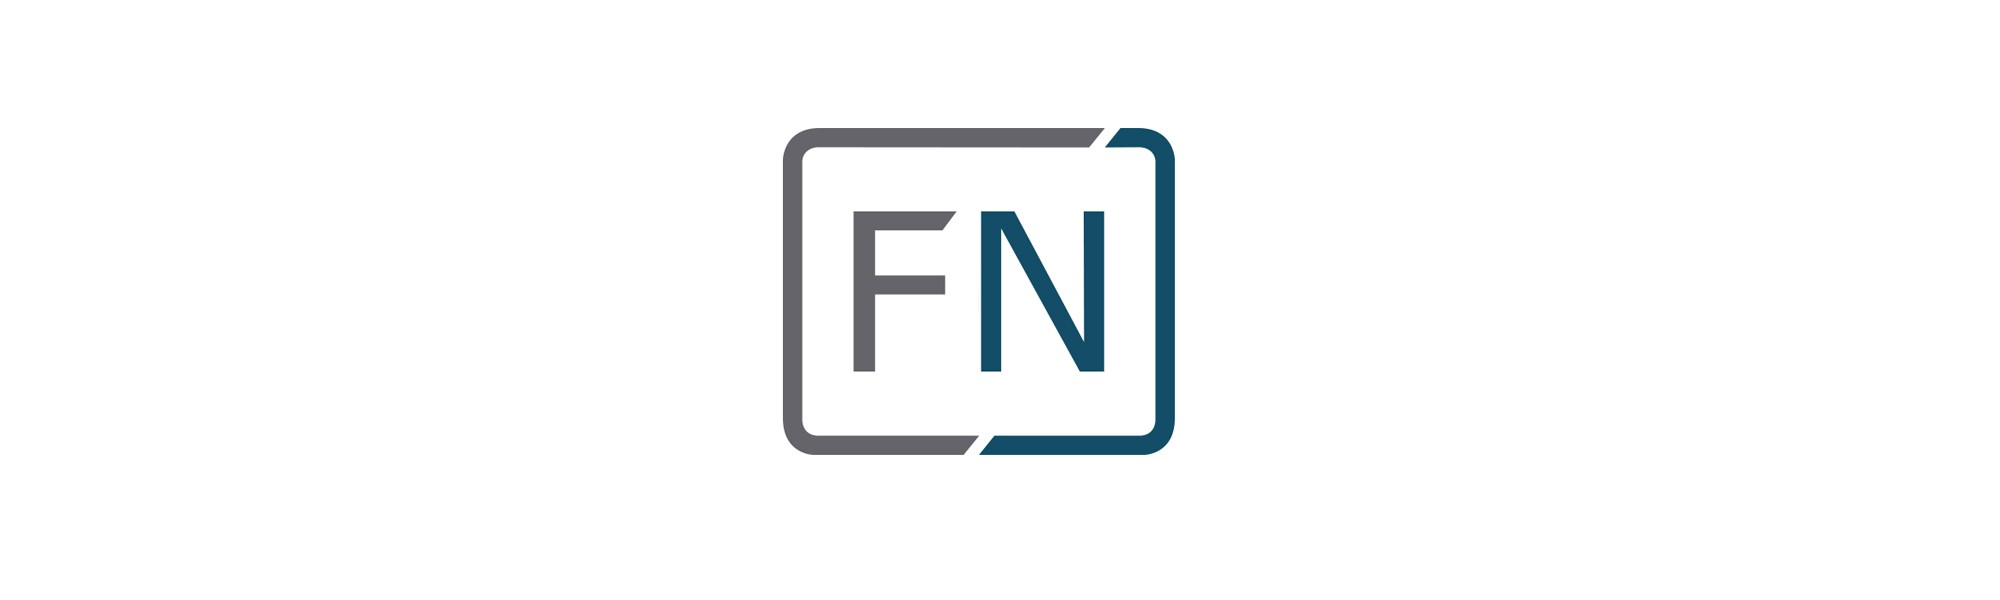 flash net sgl Broadcasting Magazine TM